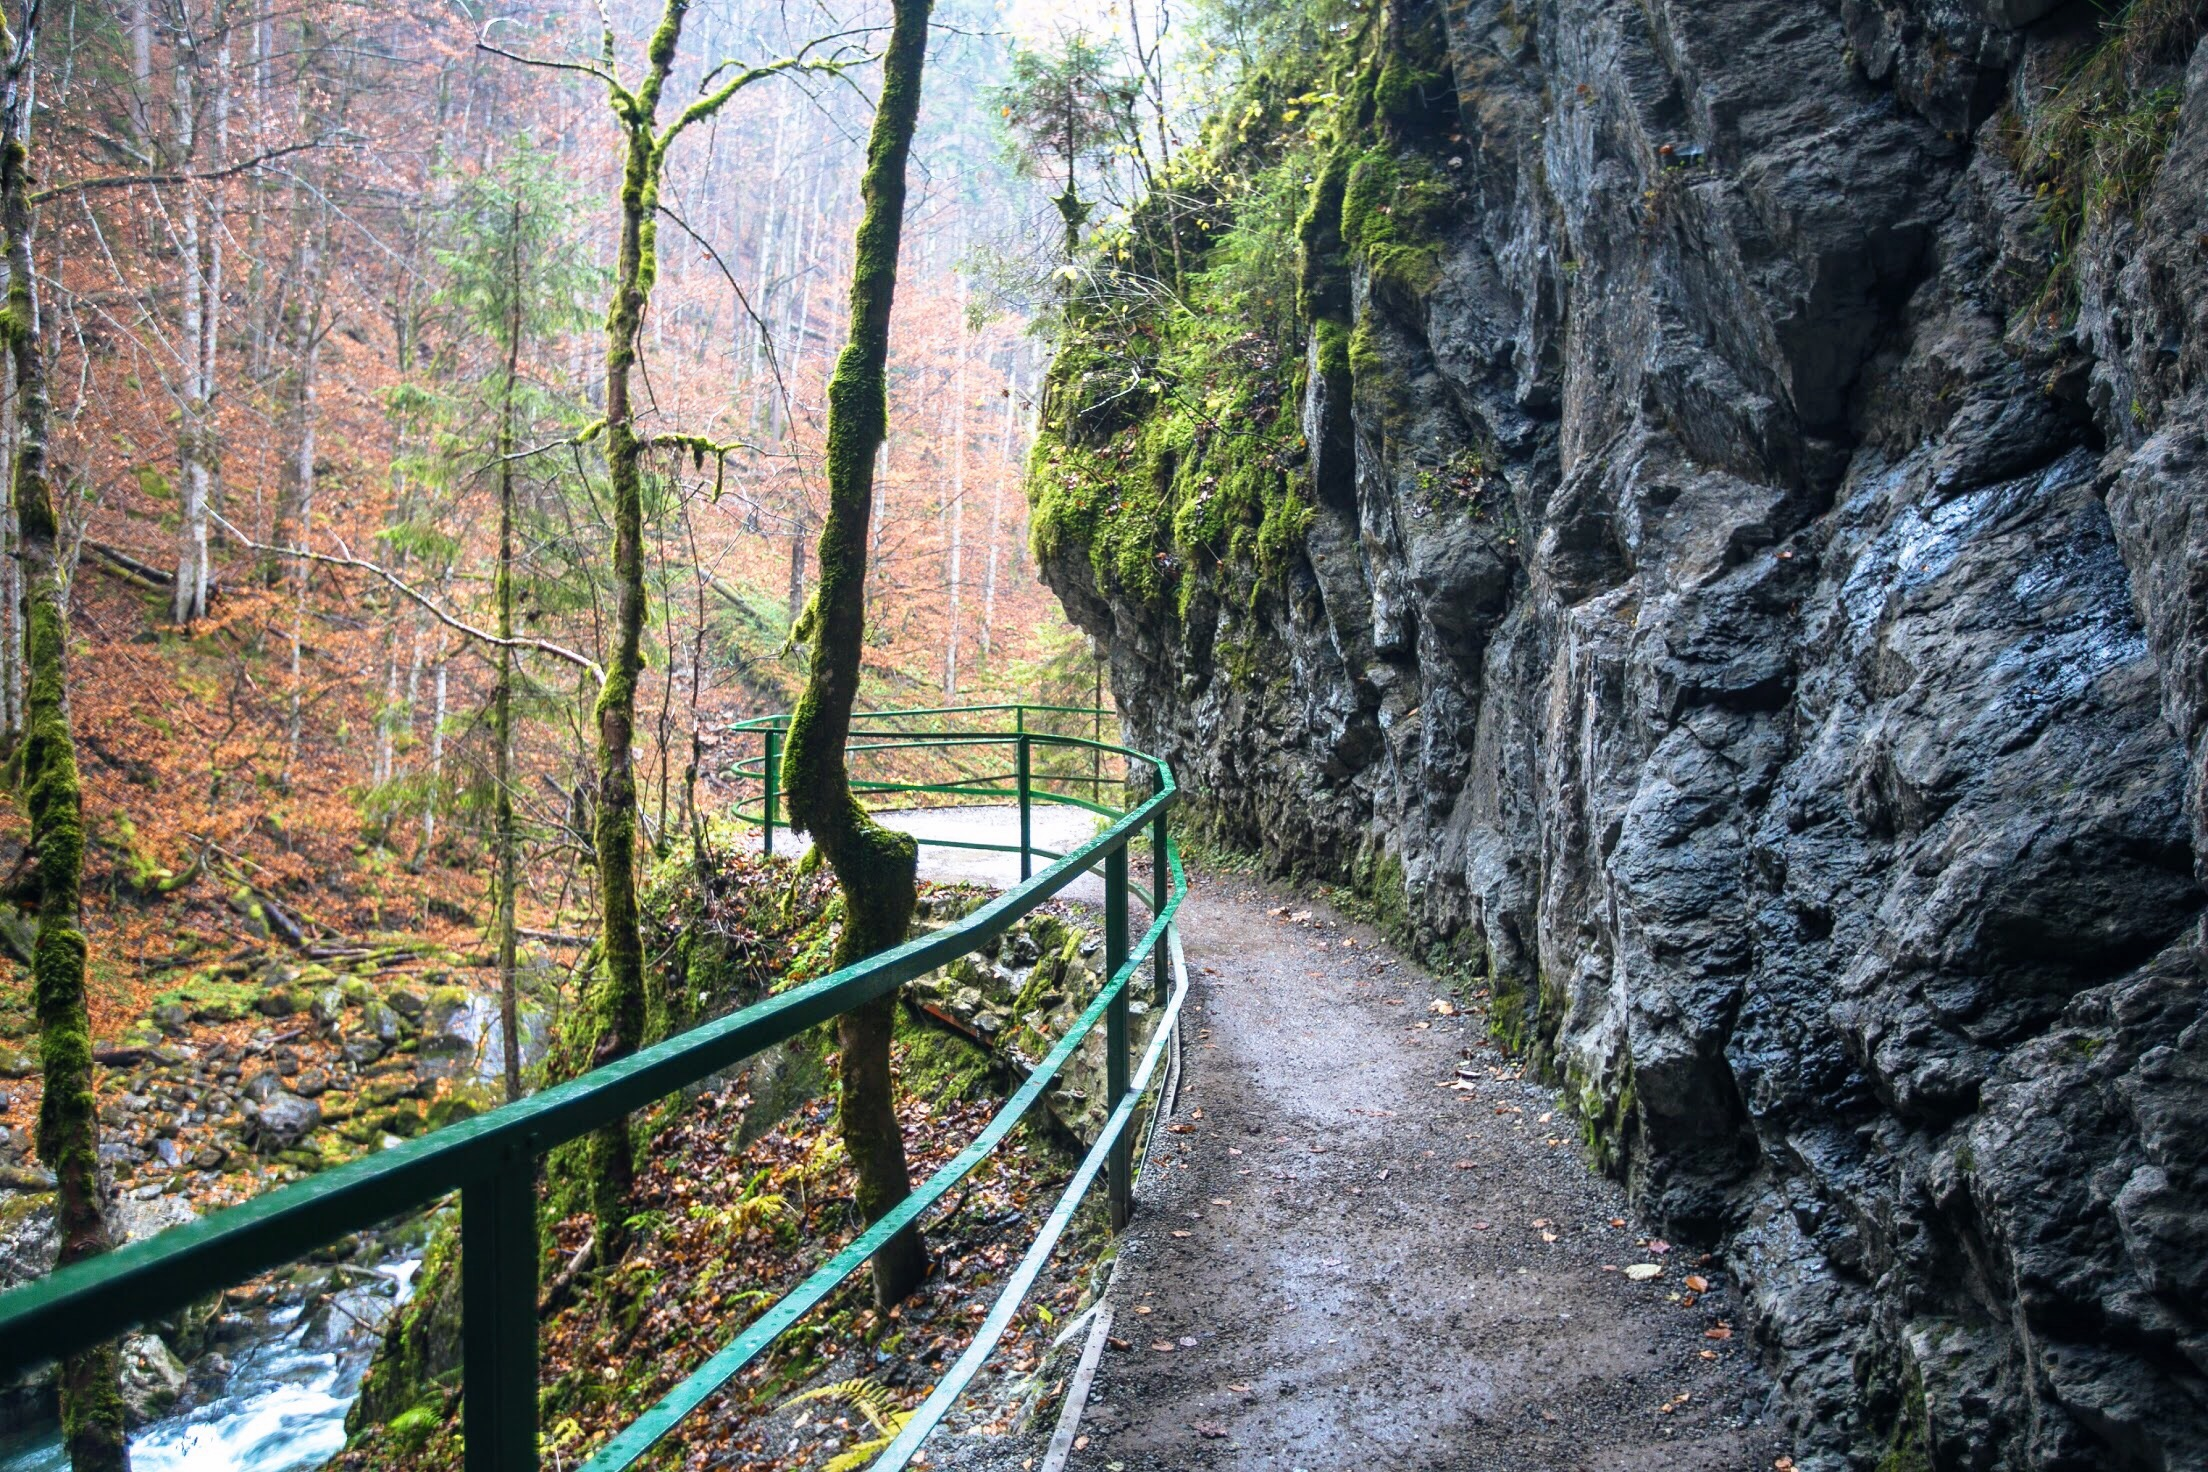 Breitachklamm, Ausflüge im Allgäu, Bayern, Aktivitäten, ausflugsziele allgäu